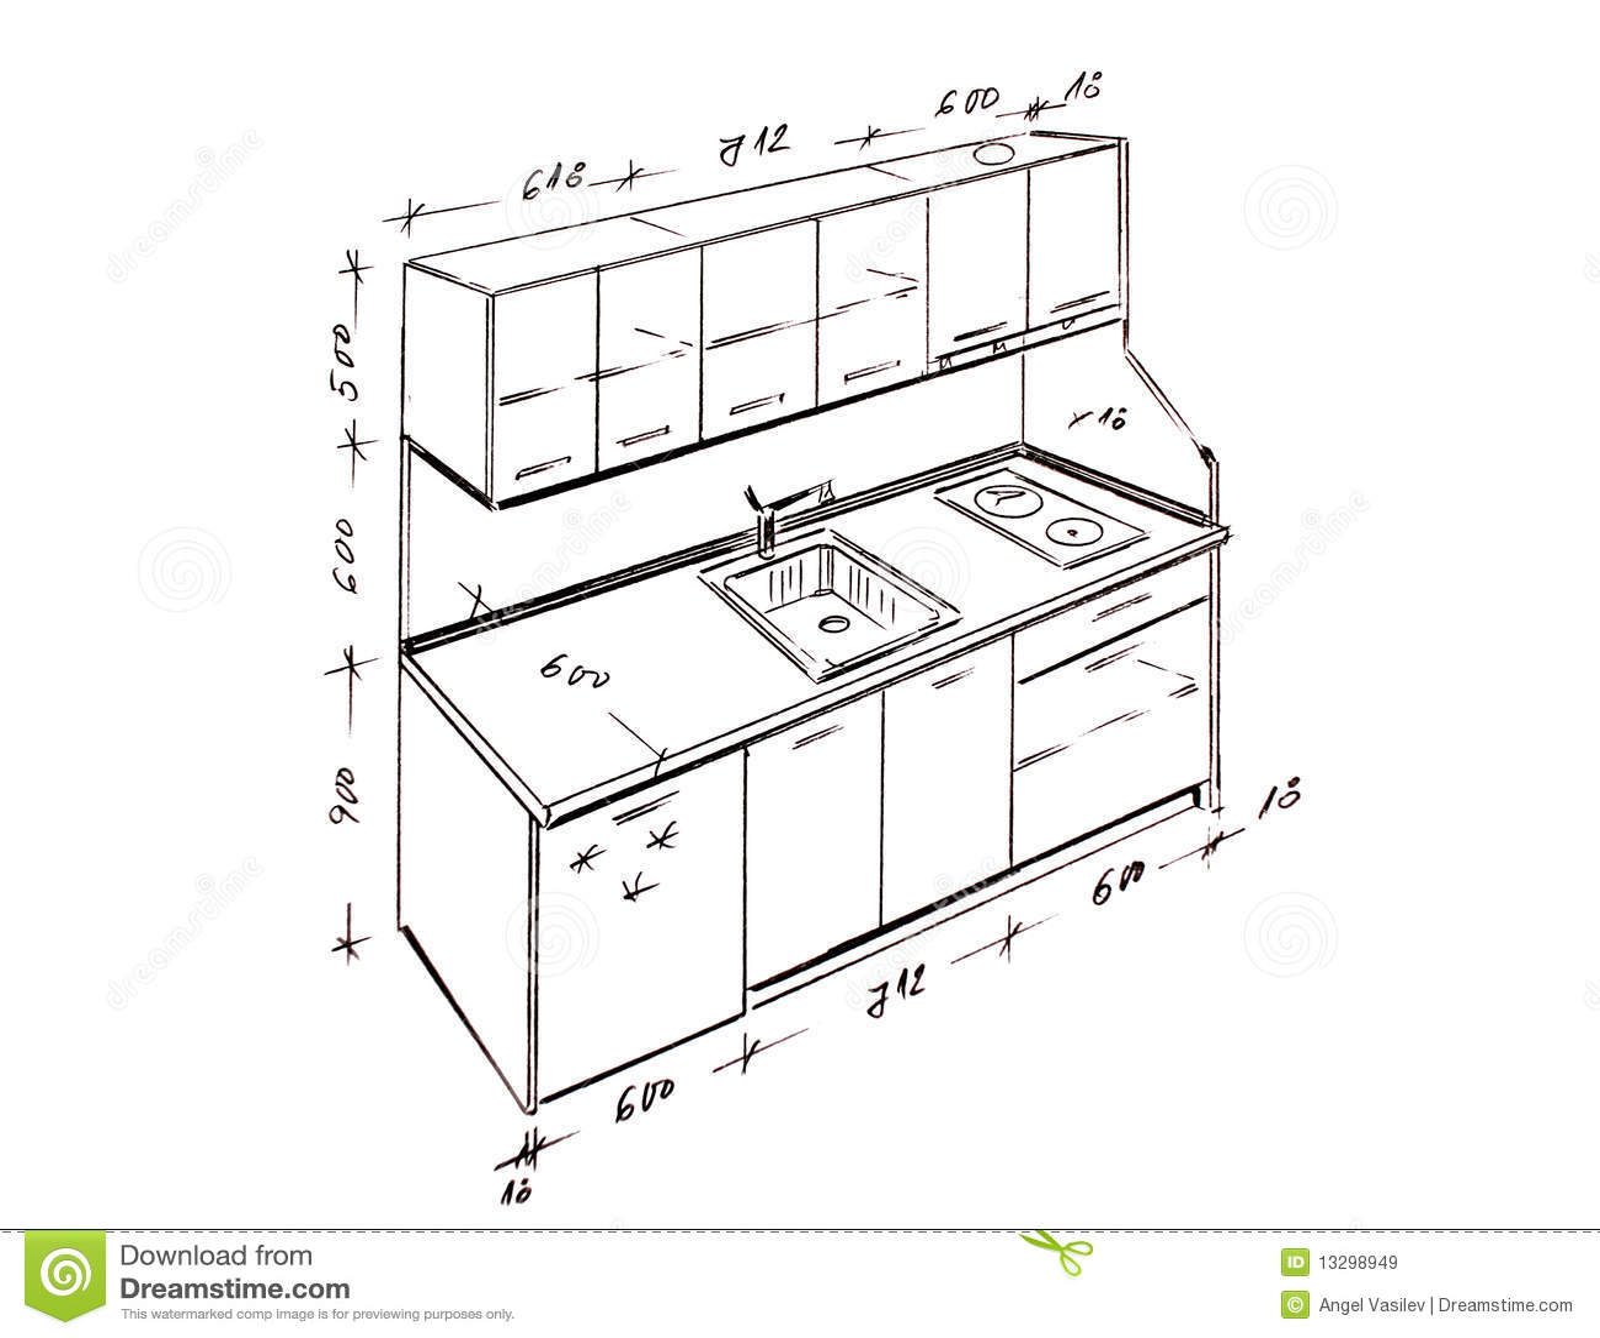 Standard Sizes For Kitchen Cabinets Desenho Moderno Da Carta Branca Da Cozinha Do Projeto